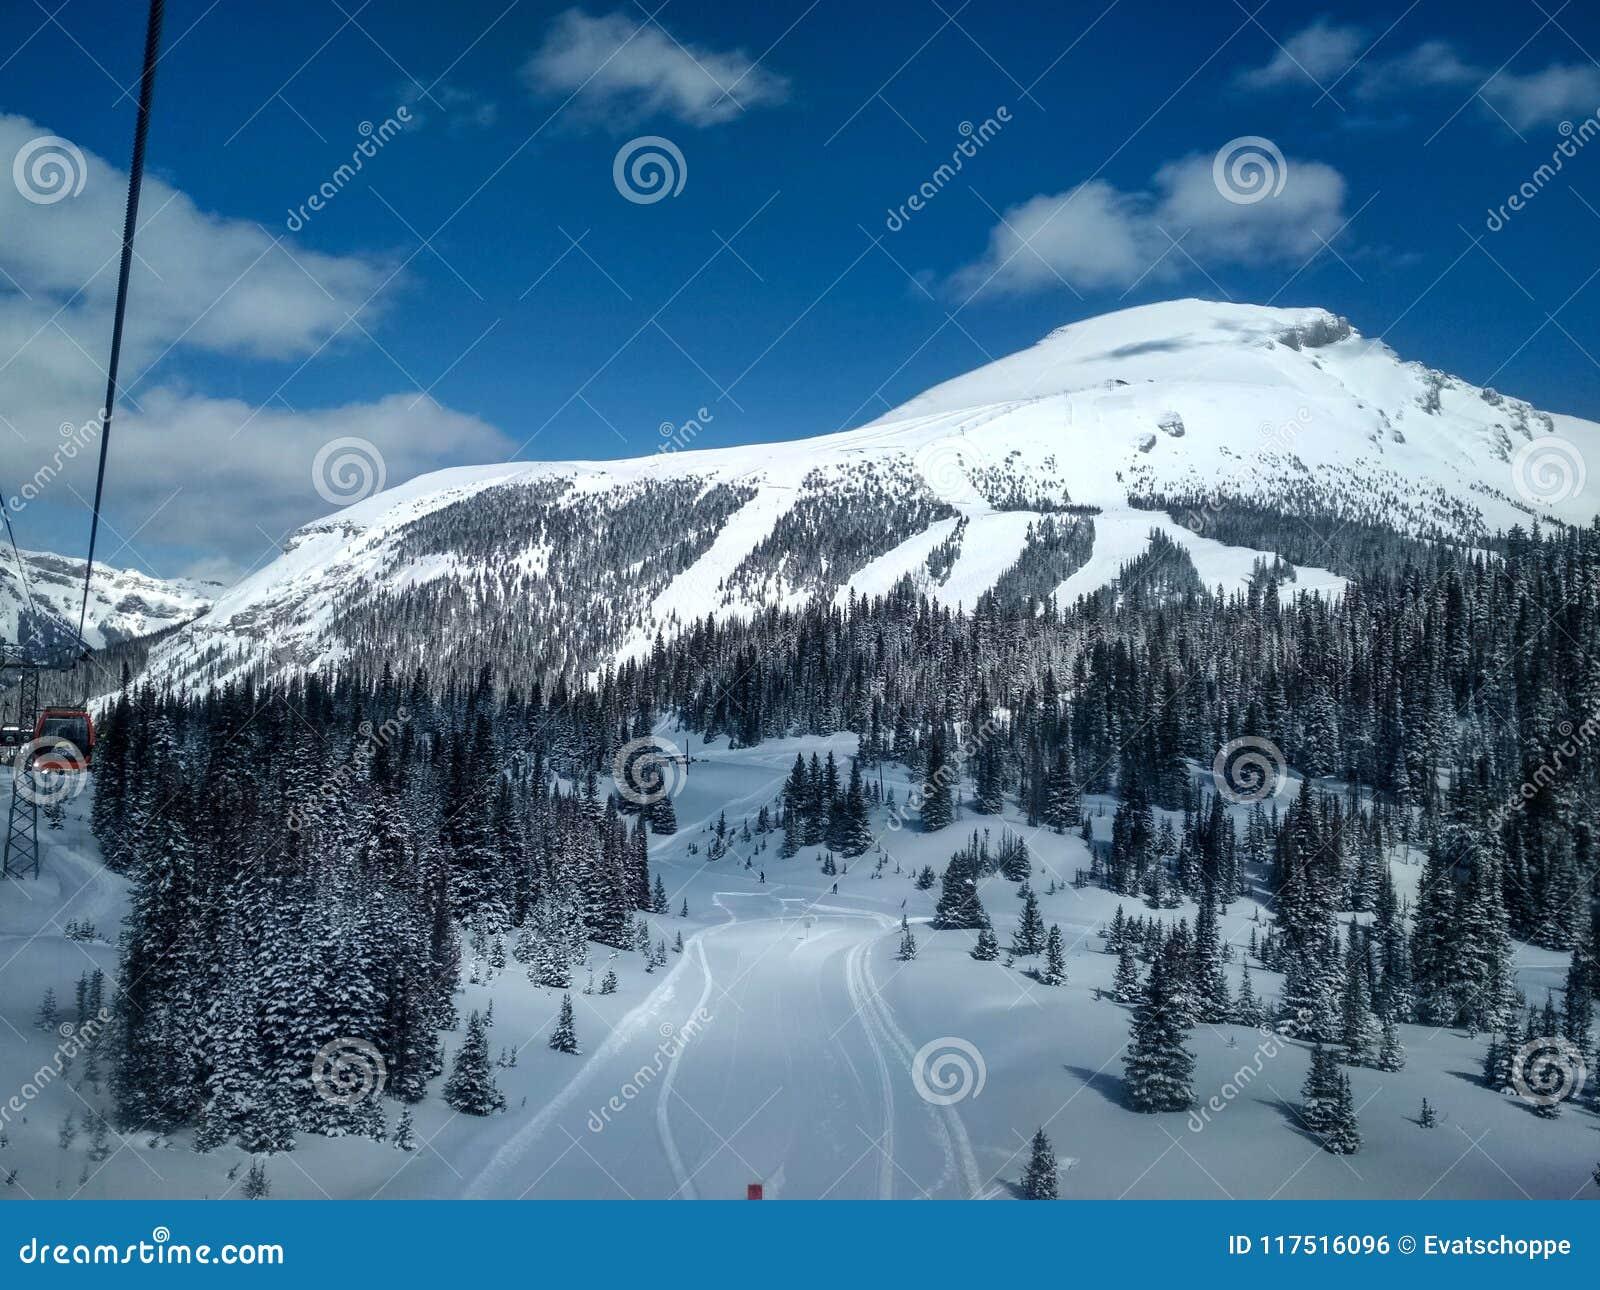 sunshine village ski resort, banff national park, alberta, canada